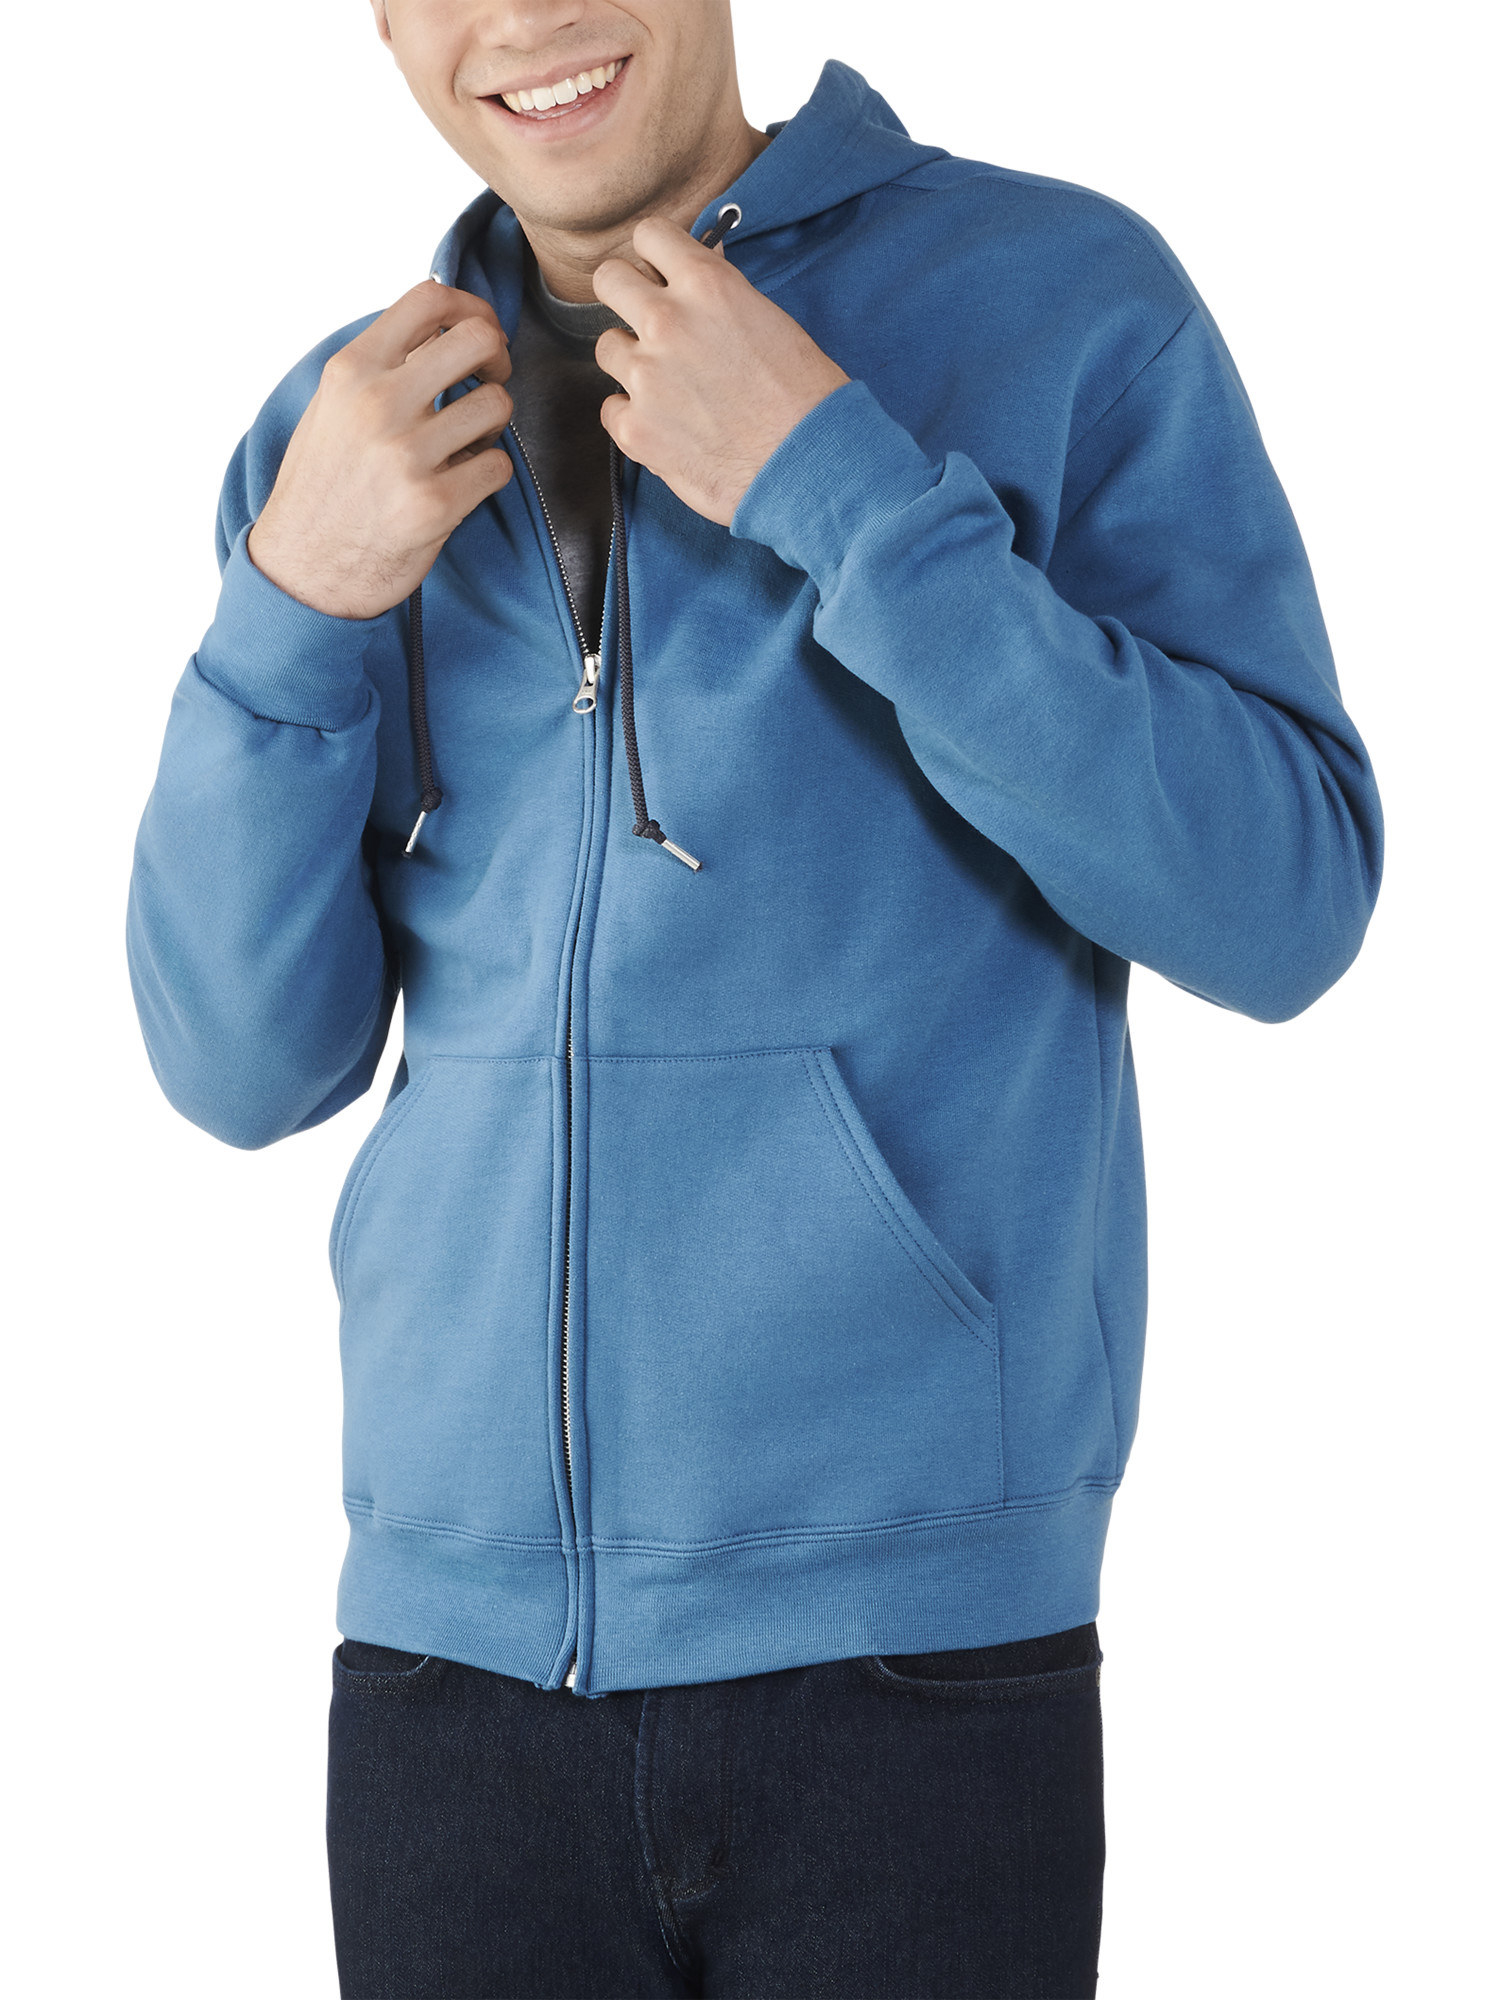 person wearing a blue zip-up hoodie jacket